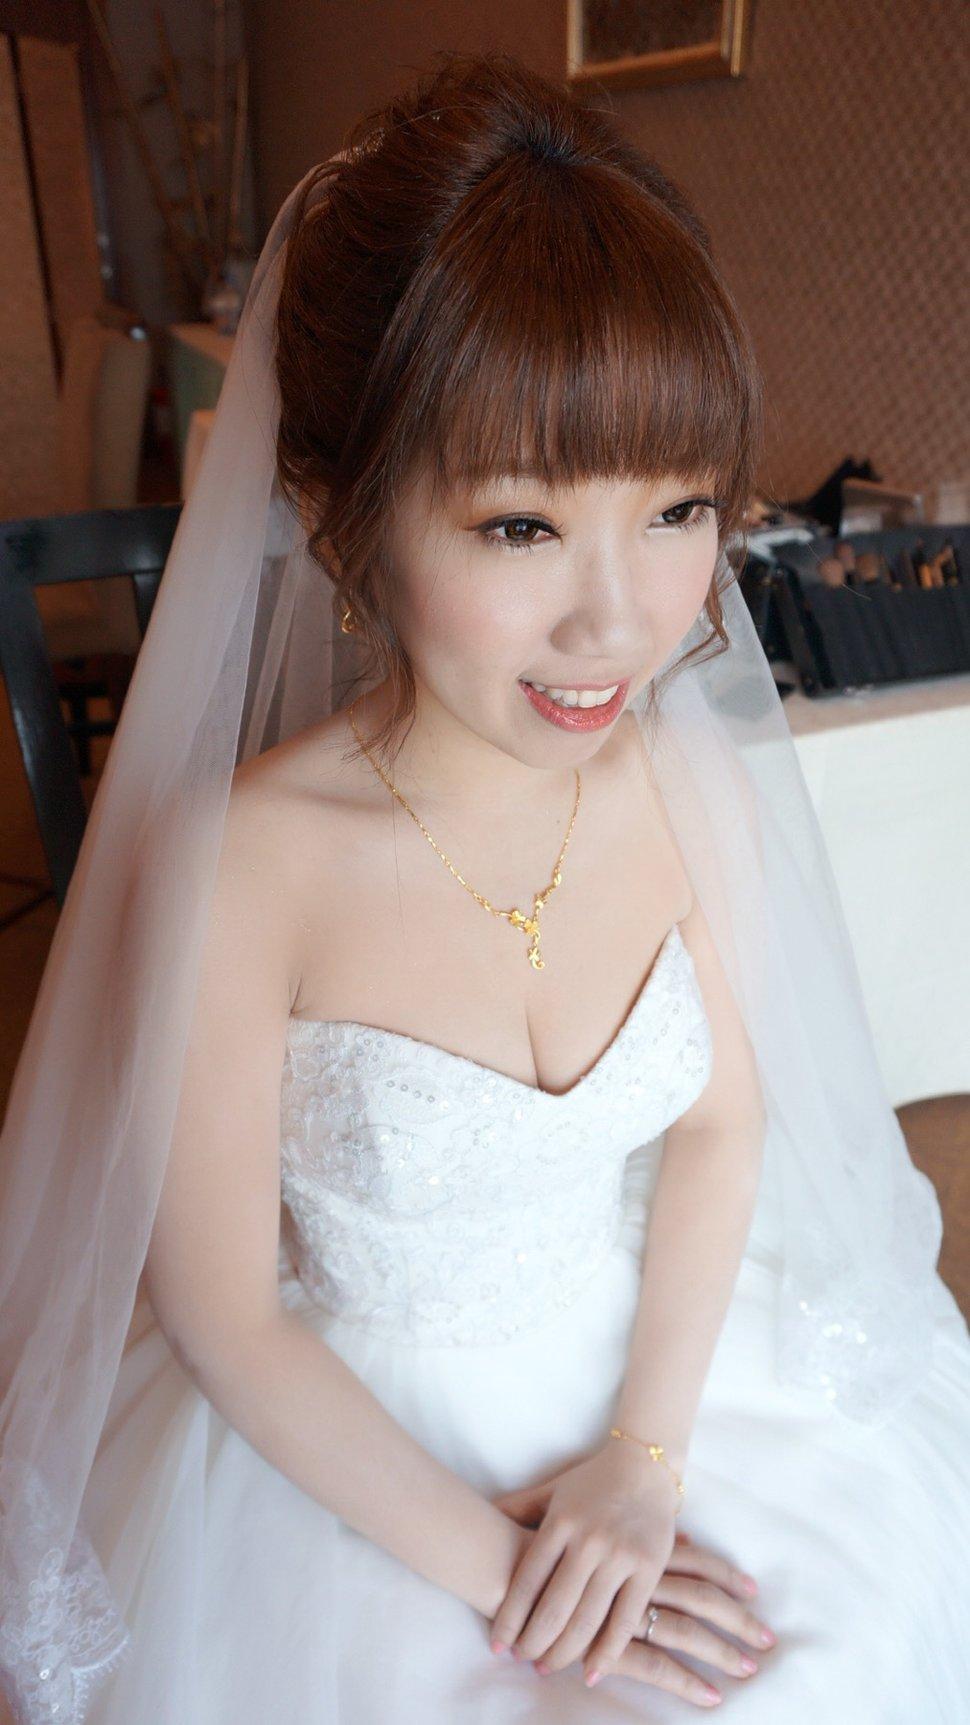 IMG_9934 - Kate忻宜 - 結婚吧